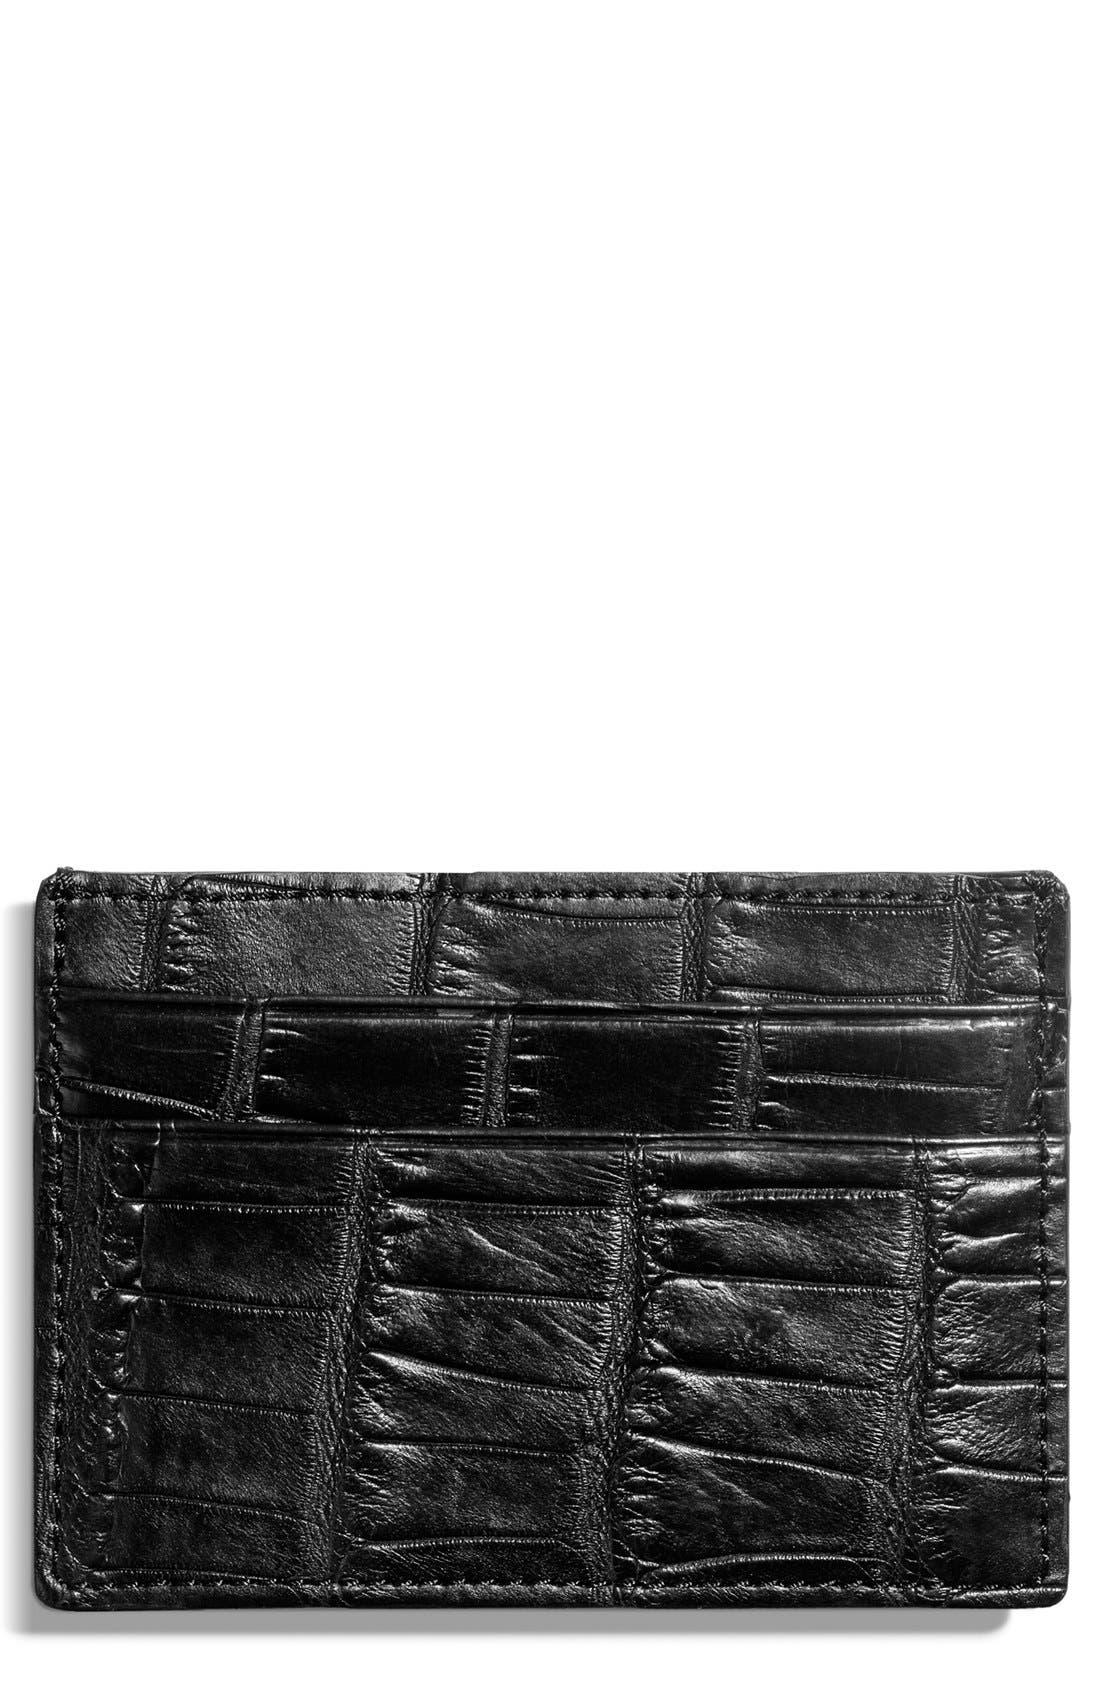 Alligator Leather Card Case,                             Alternate thumbnail 2, color,                             Black